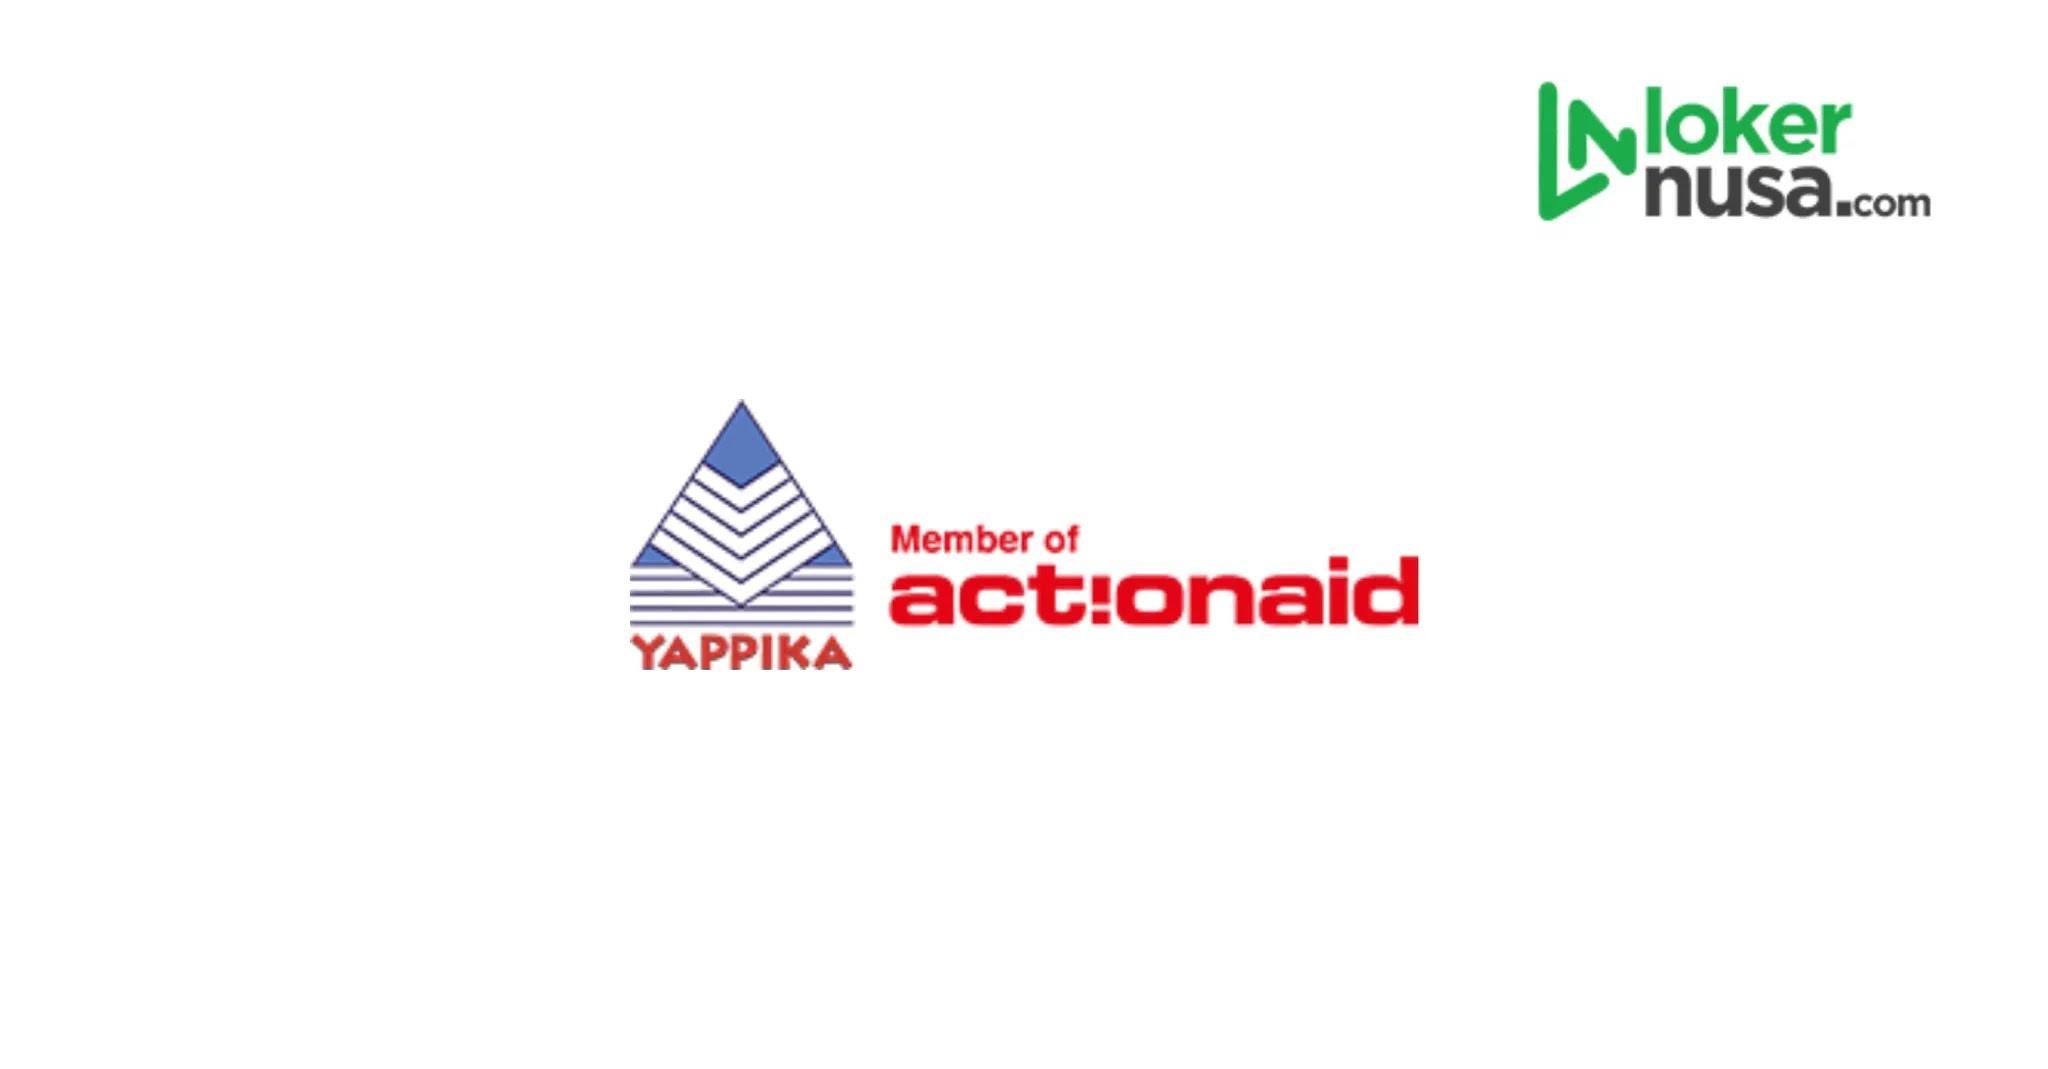 YAPPIKA ActionAid